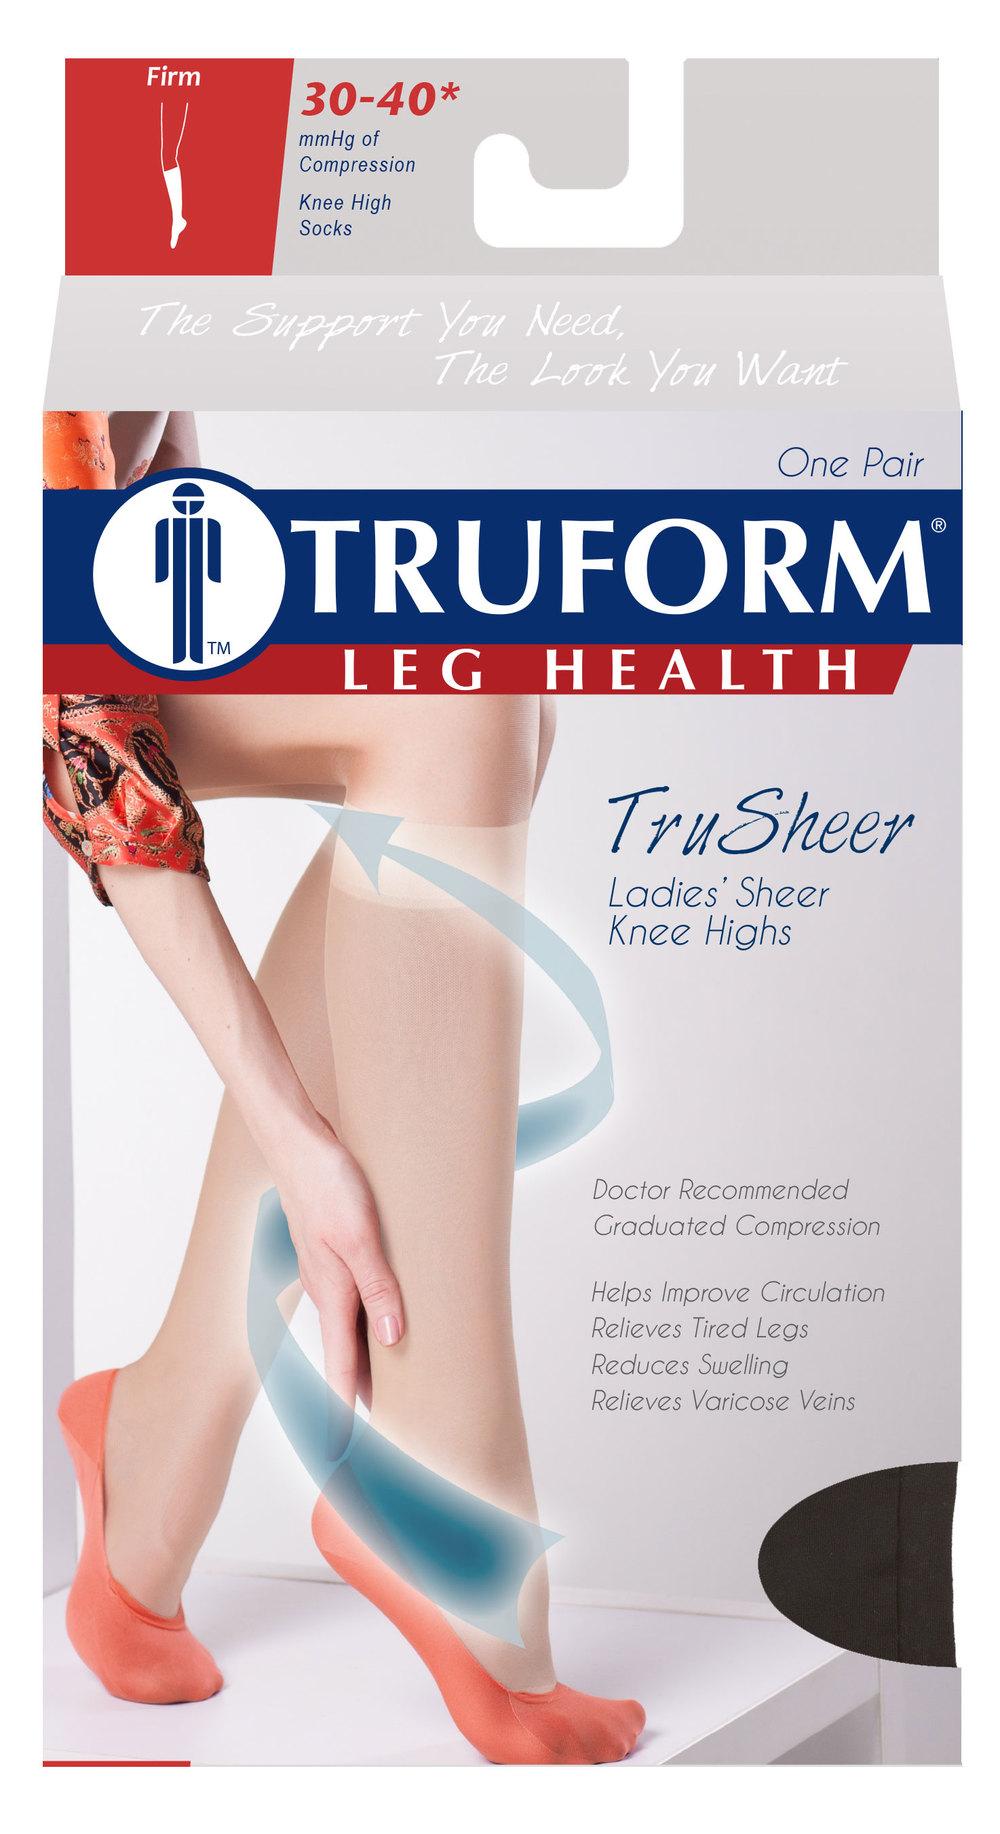 Truform, 0253, 30-40 mmHG, TruSheer, Knee High, Package